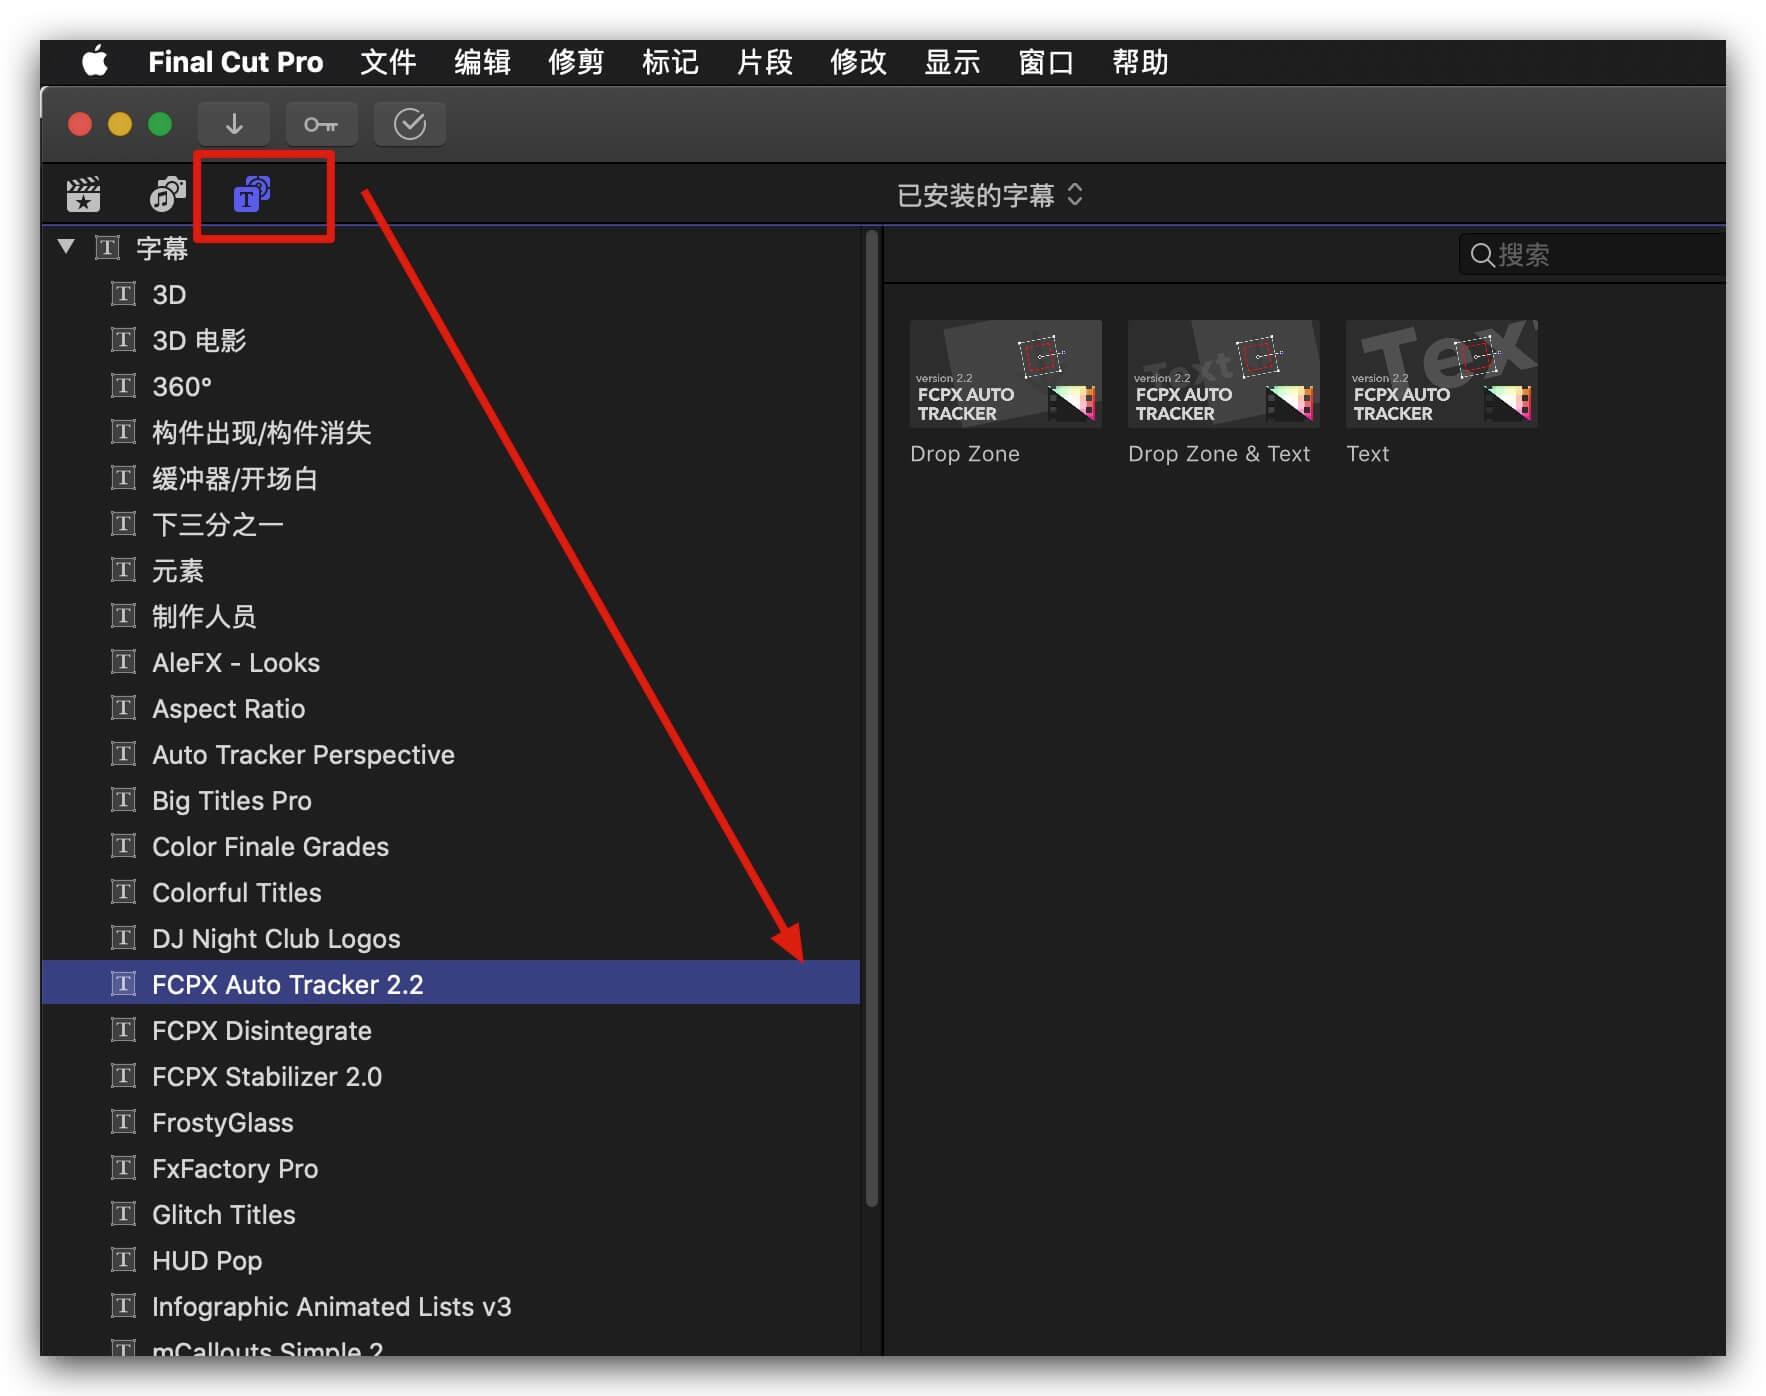 fcpx插件 视频图片文字字幕自动跟踪效果 支持 fcpx 10.5.1 fcpx Auto Tracker 2.2